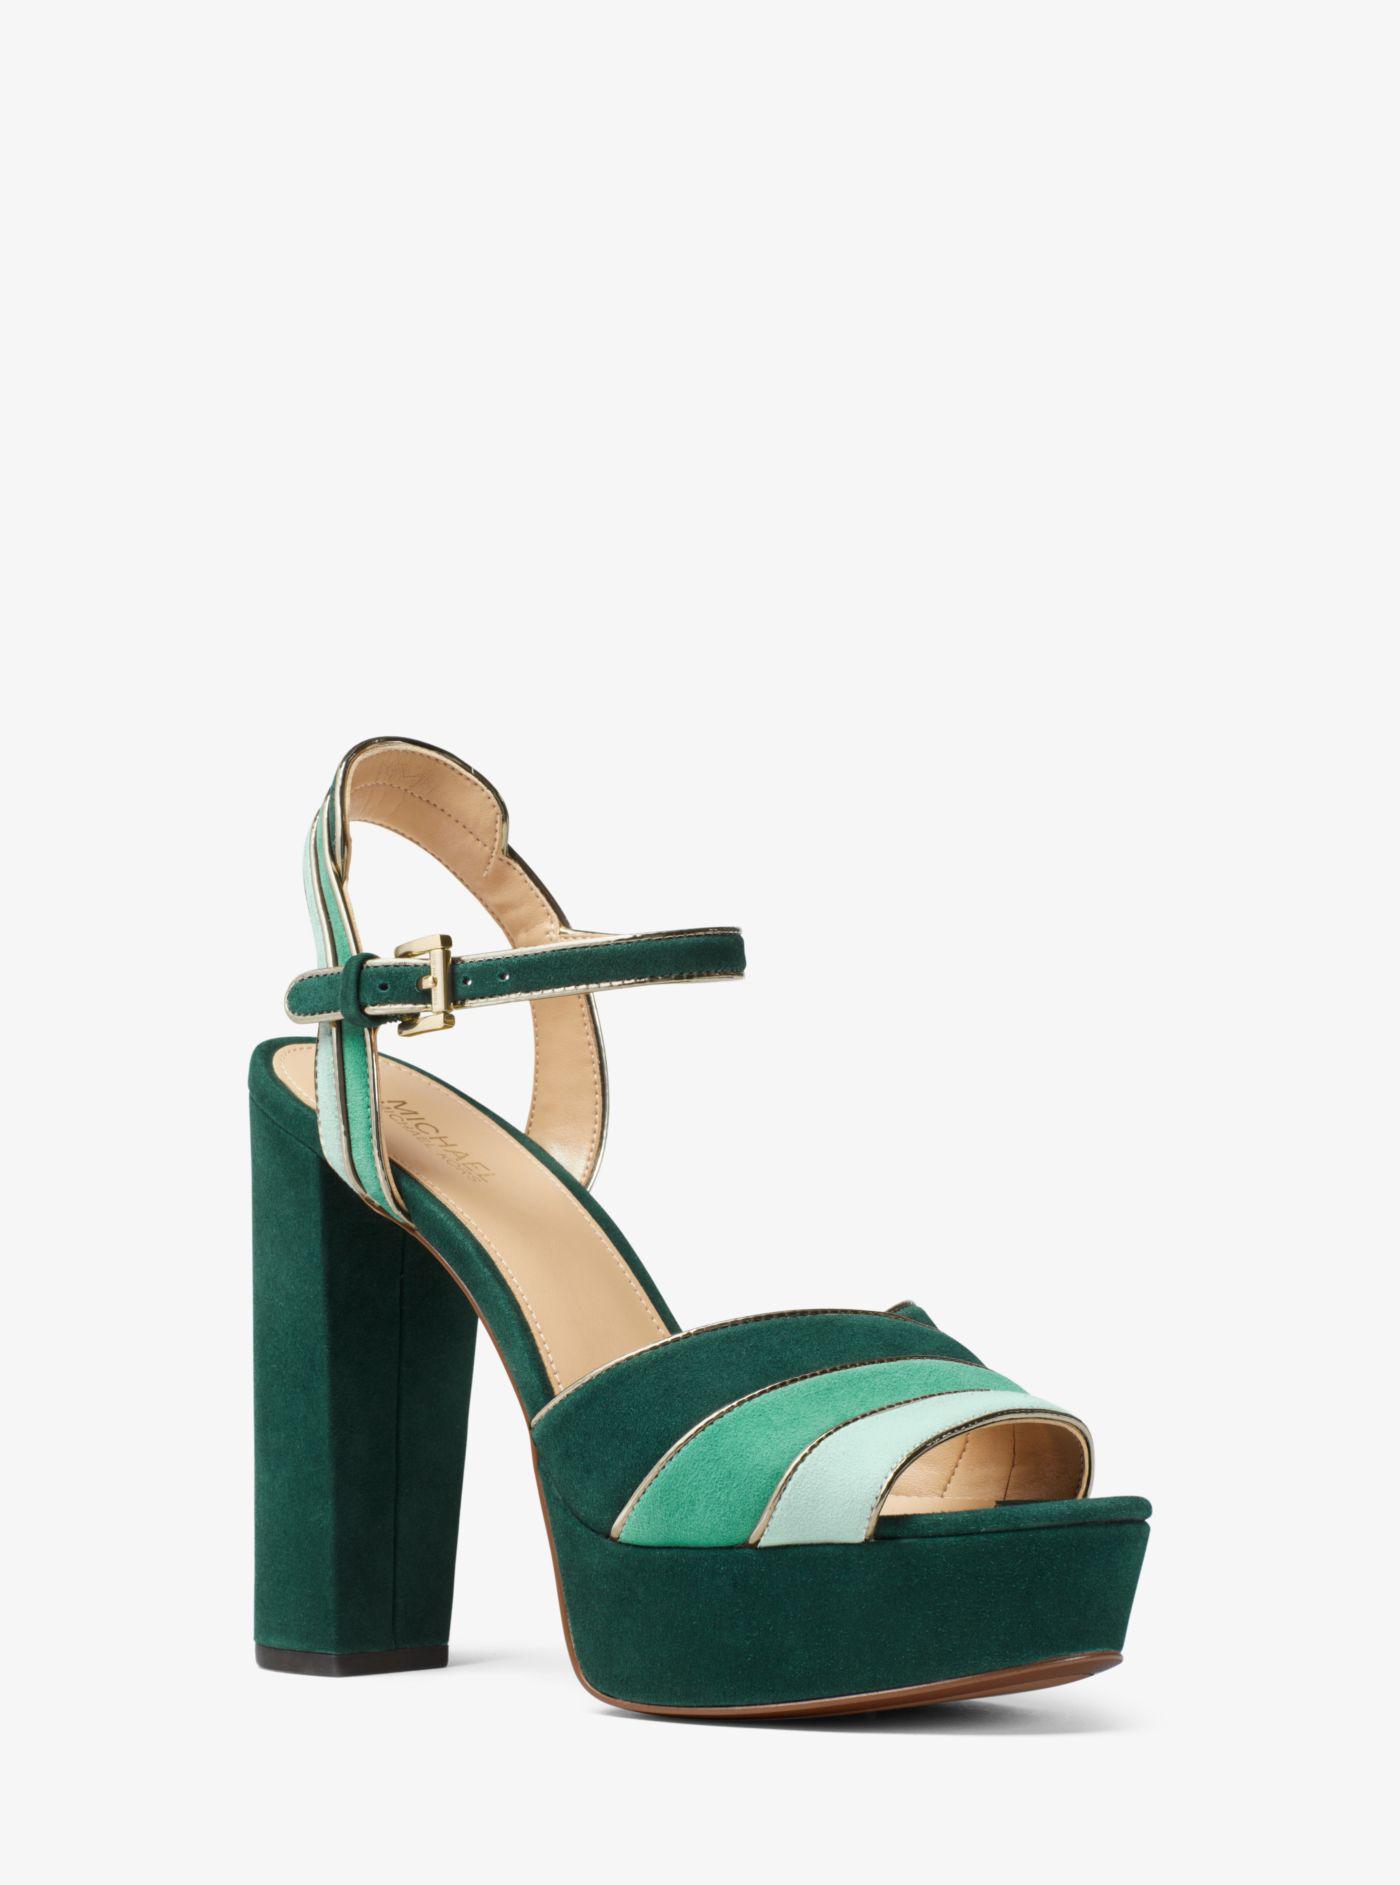 db41a4a05faa Lyst - Michael Kors Harper Tri-color Suede Platform Sandal in Green